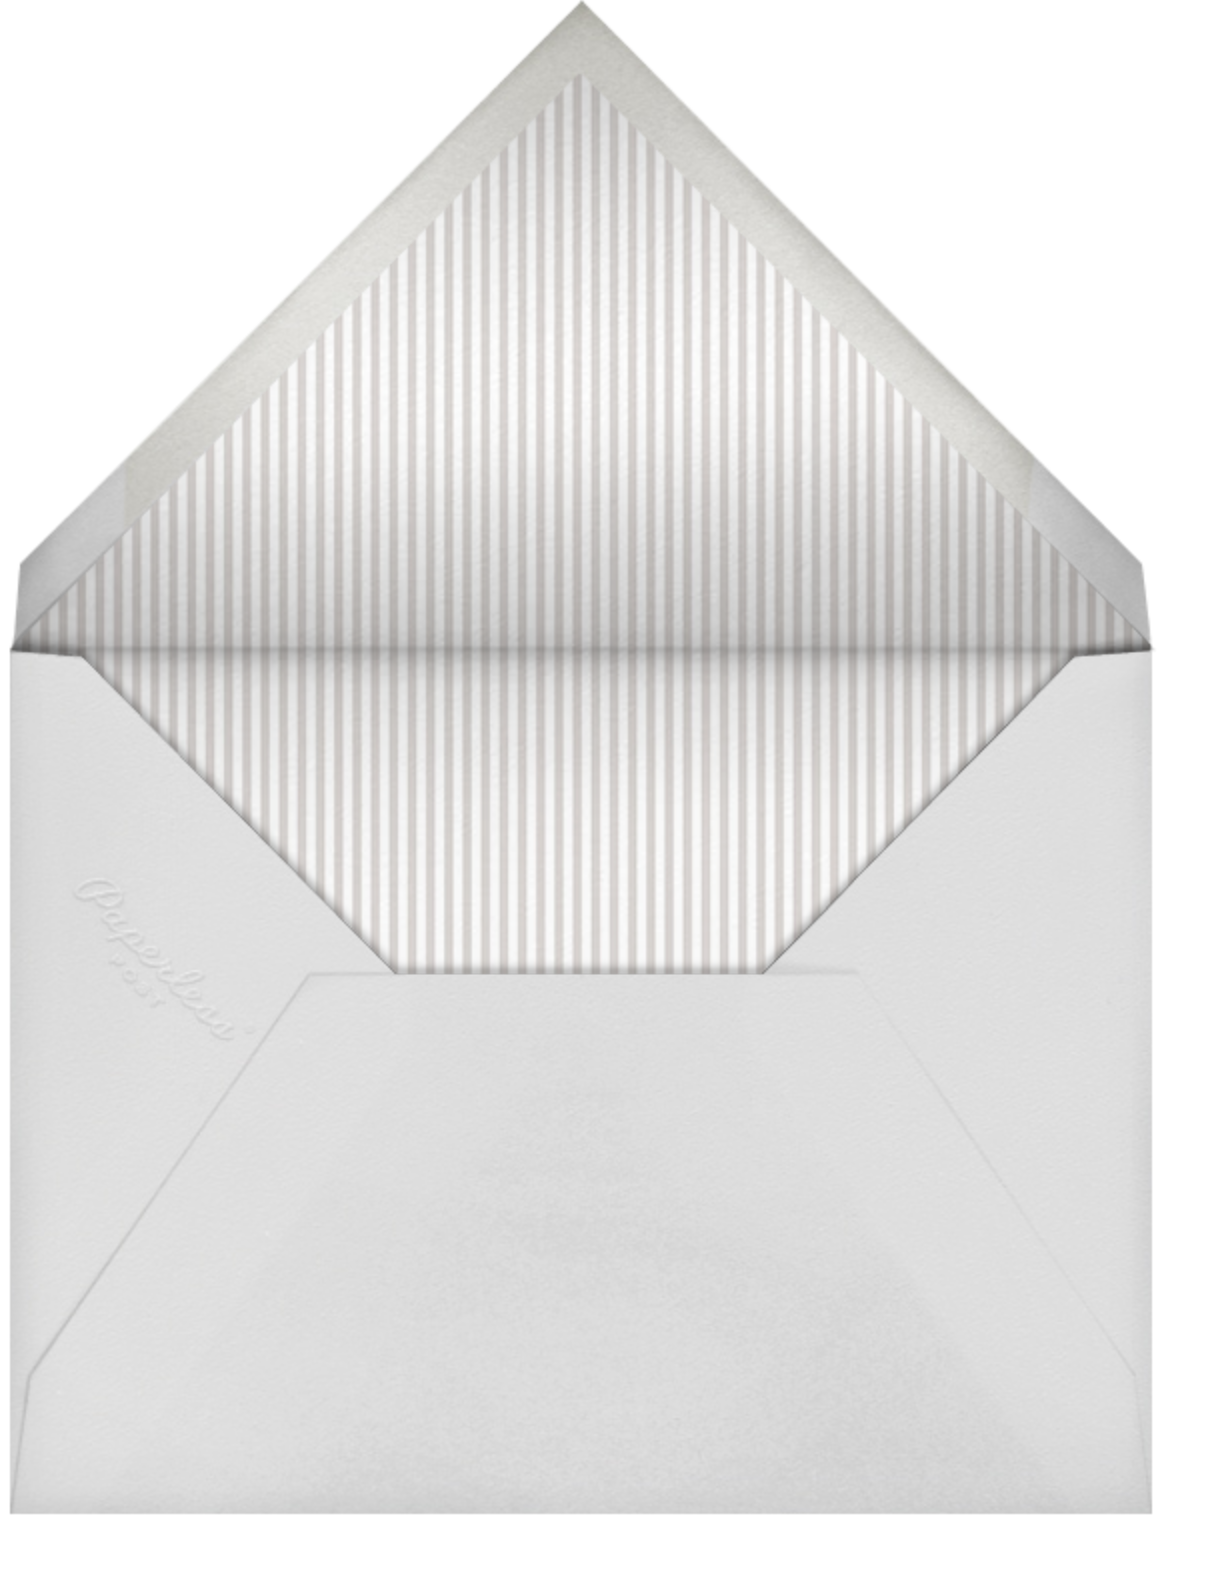 Celebration Dots - Gray/Gold - Sugar Paper - Anniversary party - envelope back